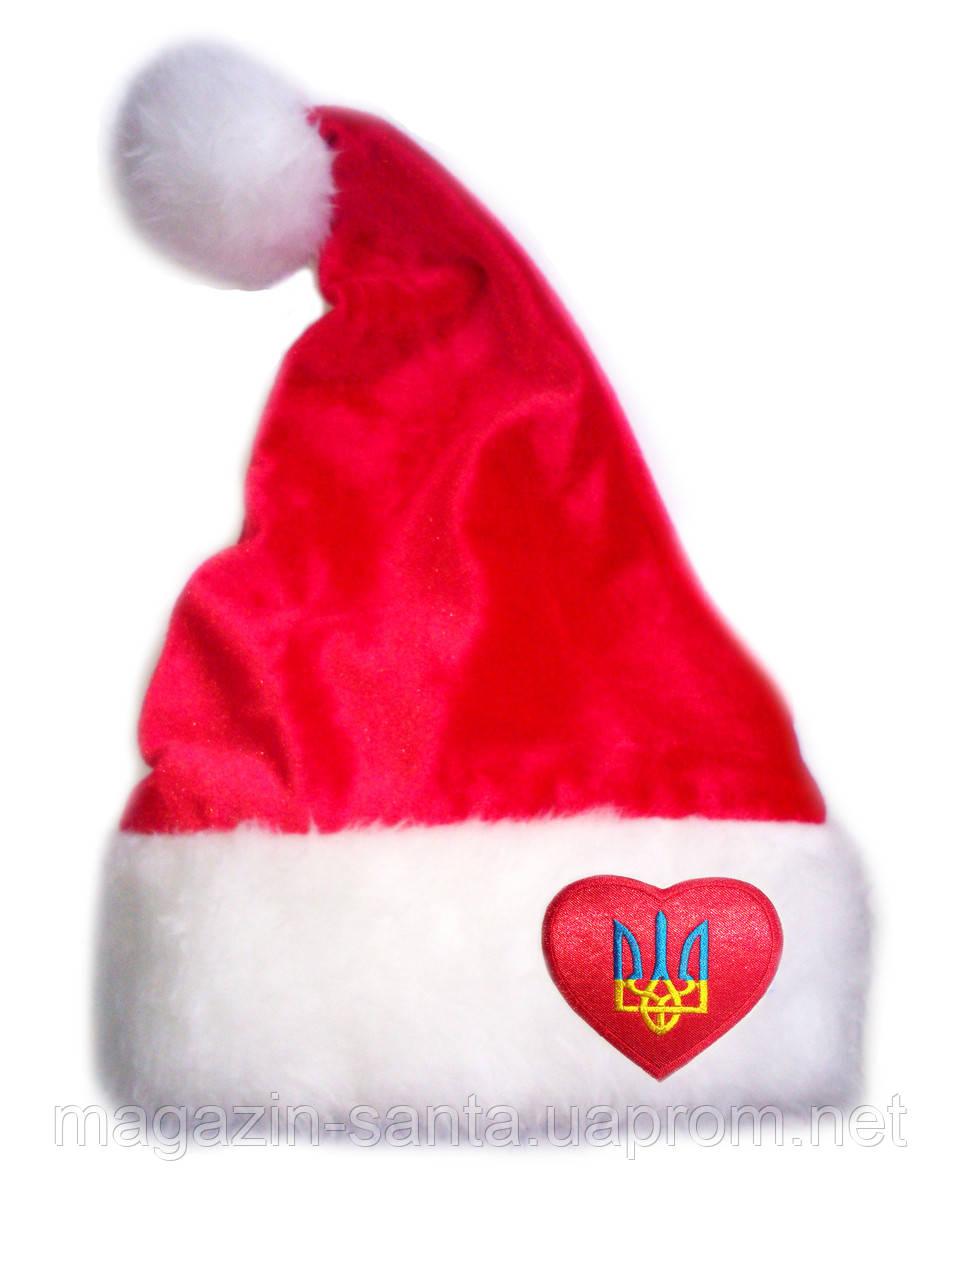 "Новорічна Шапка Діда Мороза Ковпак Санта Клауса Santa Claus червона ""Герб в сердечку"""